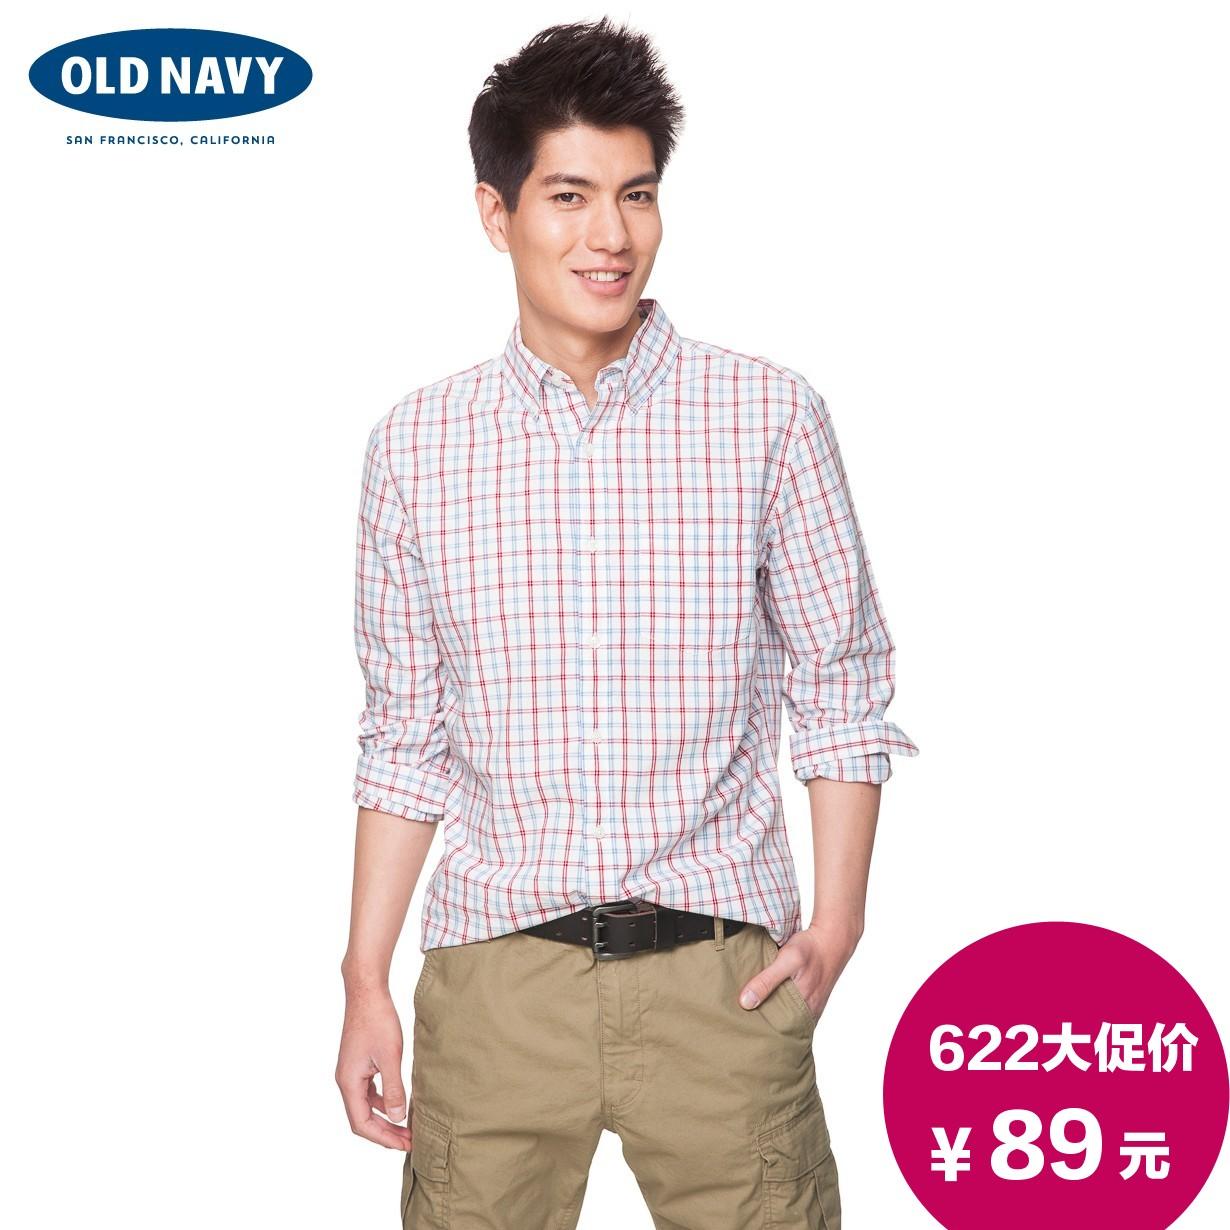 Рубашка мужская OLD NAVY 000172155 172155 149 рубашка мужская old navy 000438245 438245